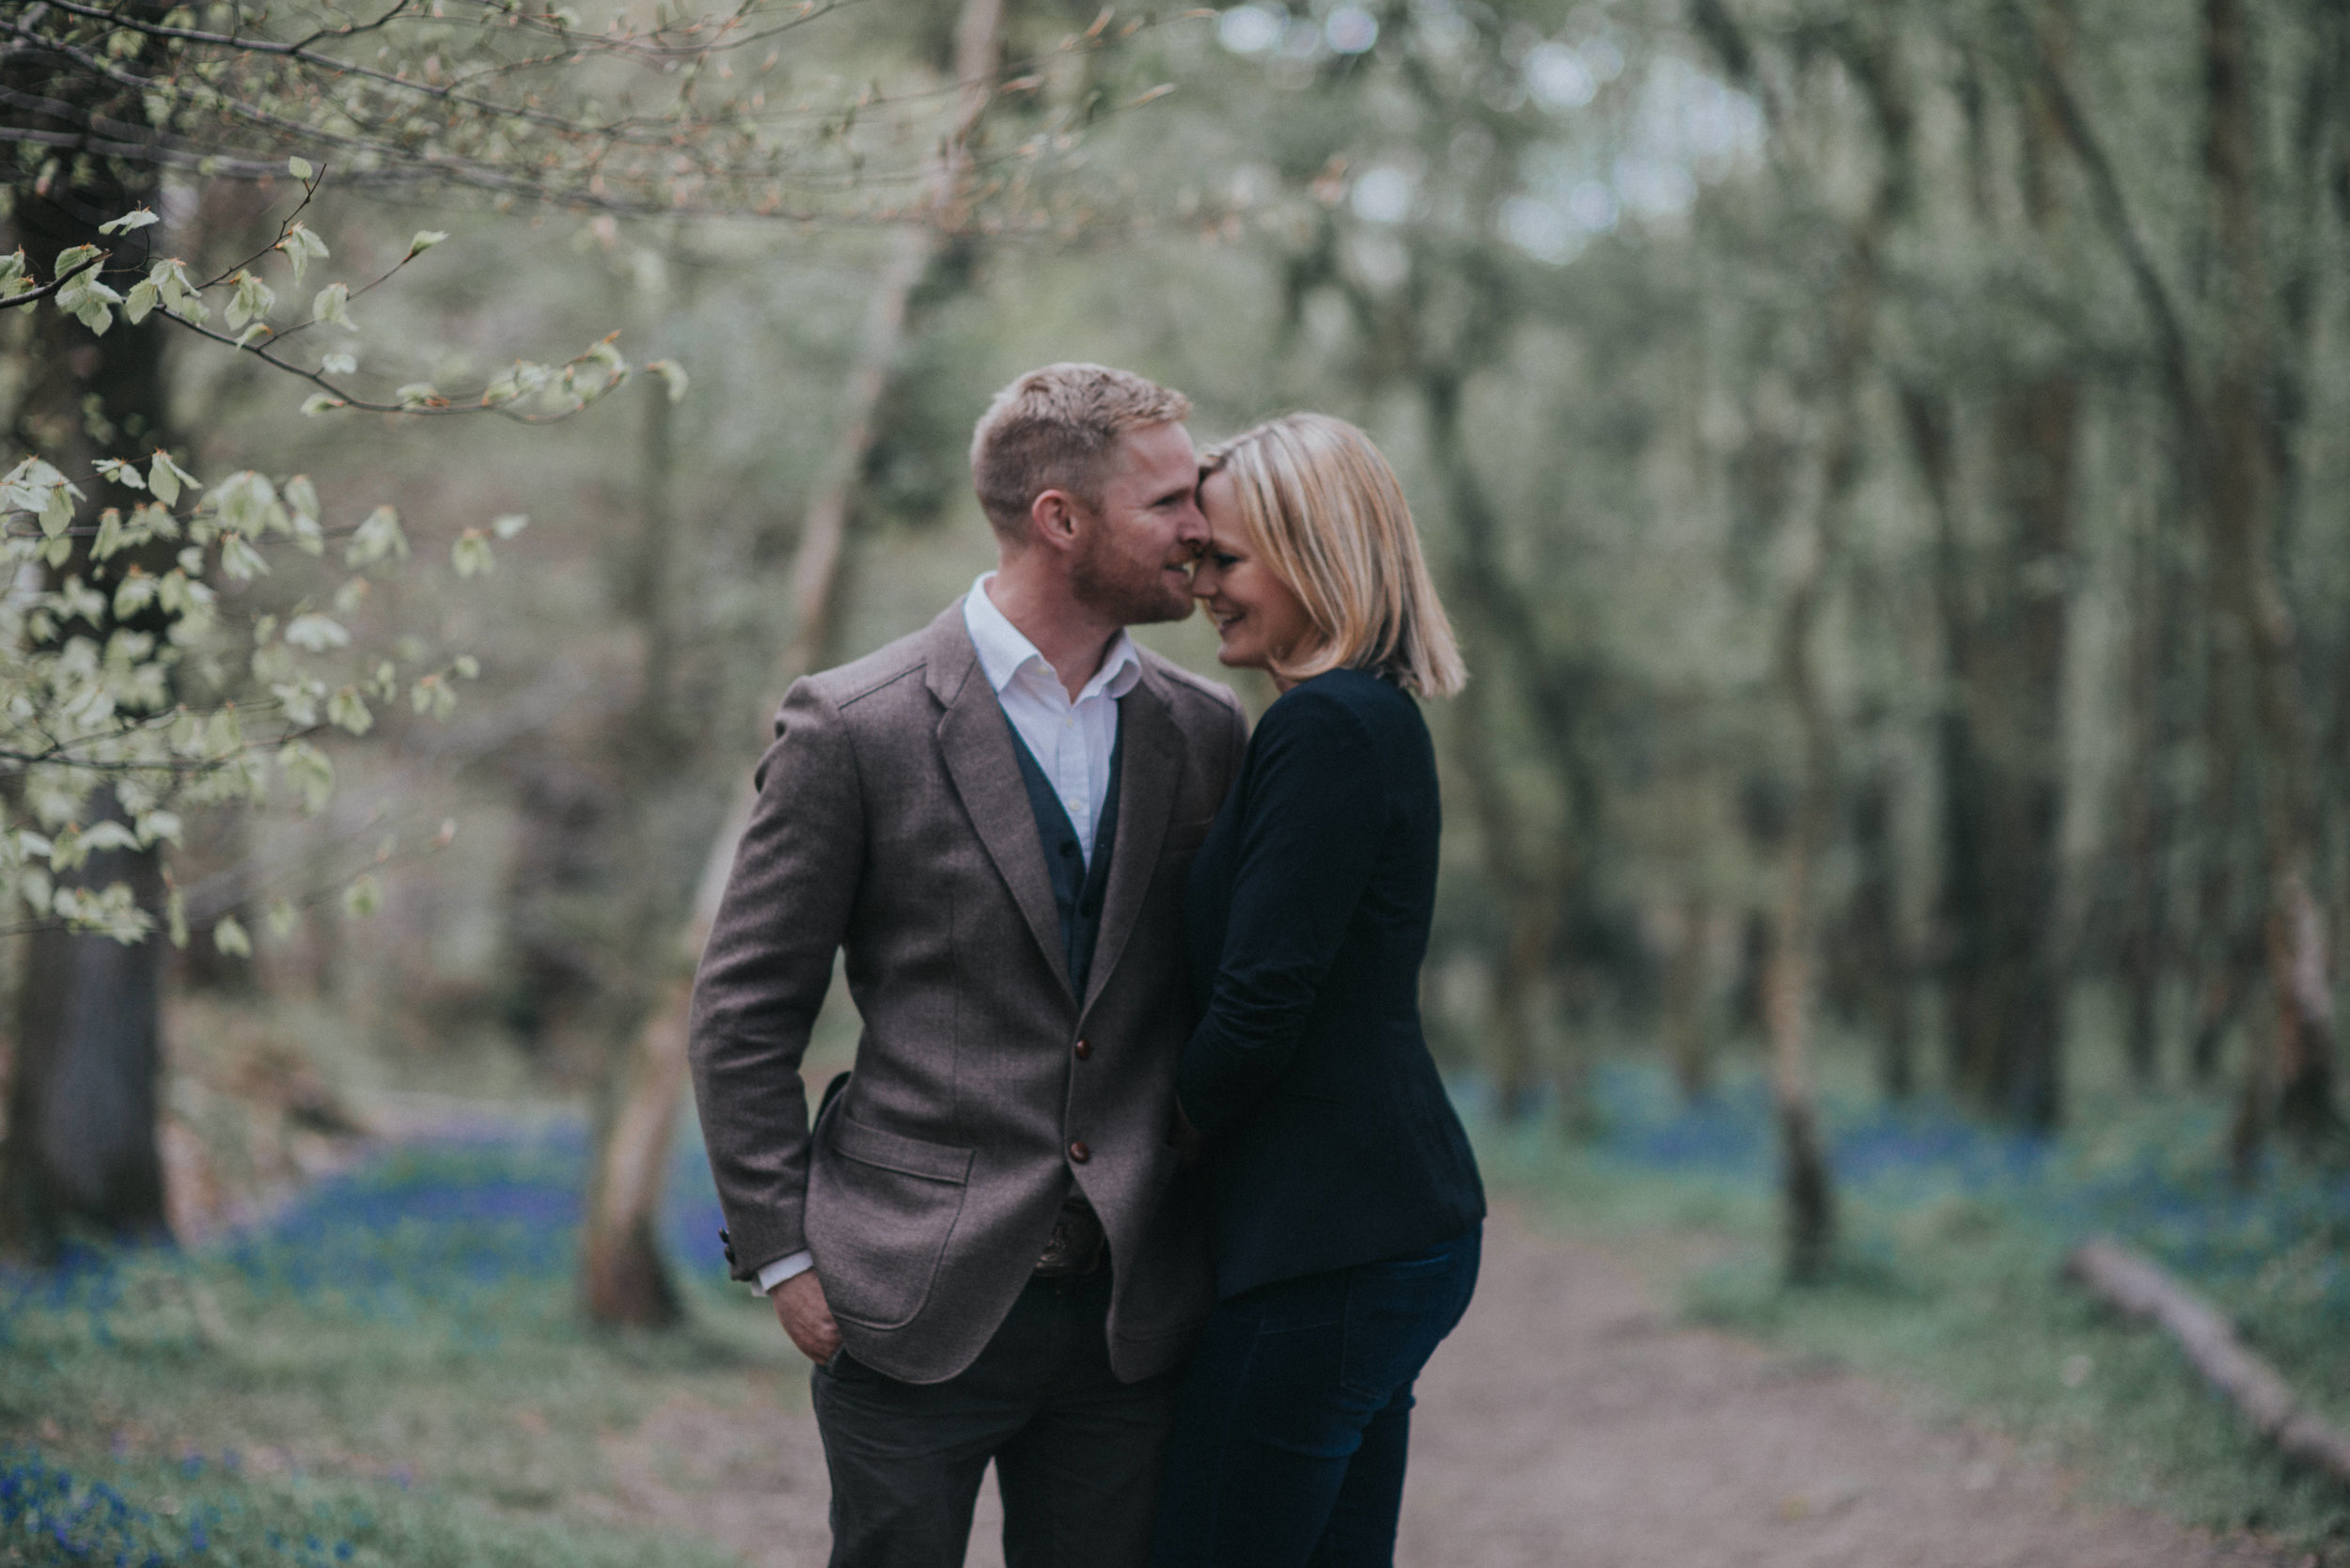 Falconhurst Estate wedding photographer sussex